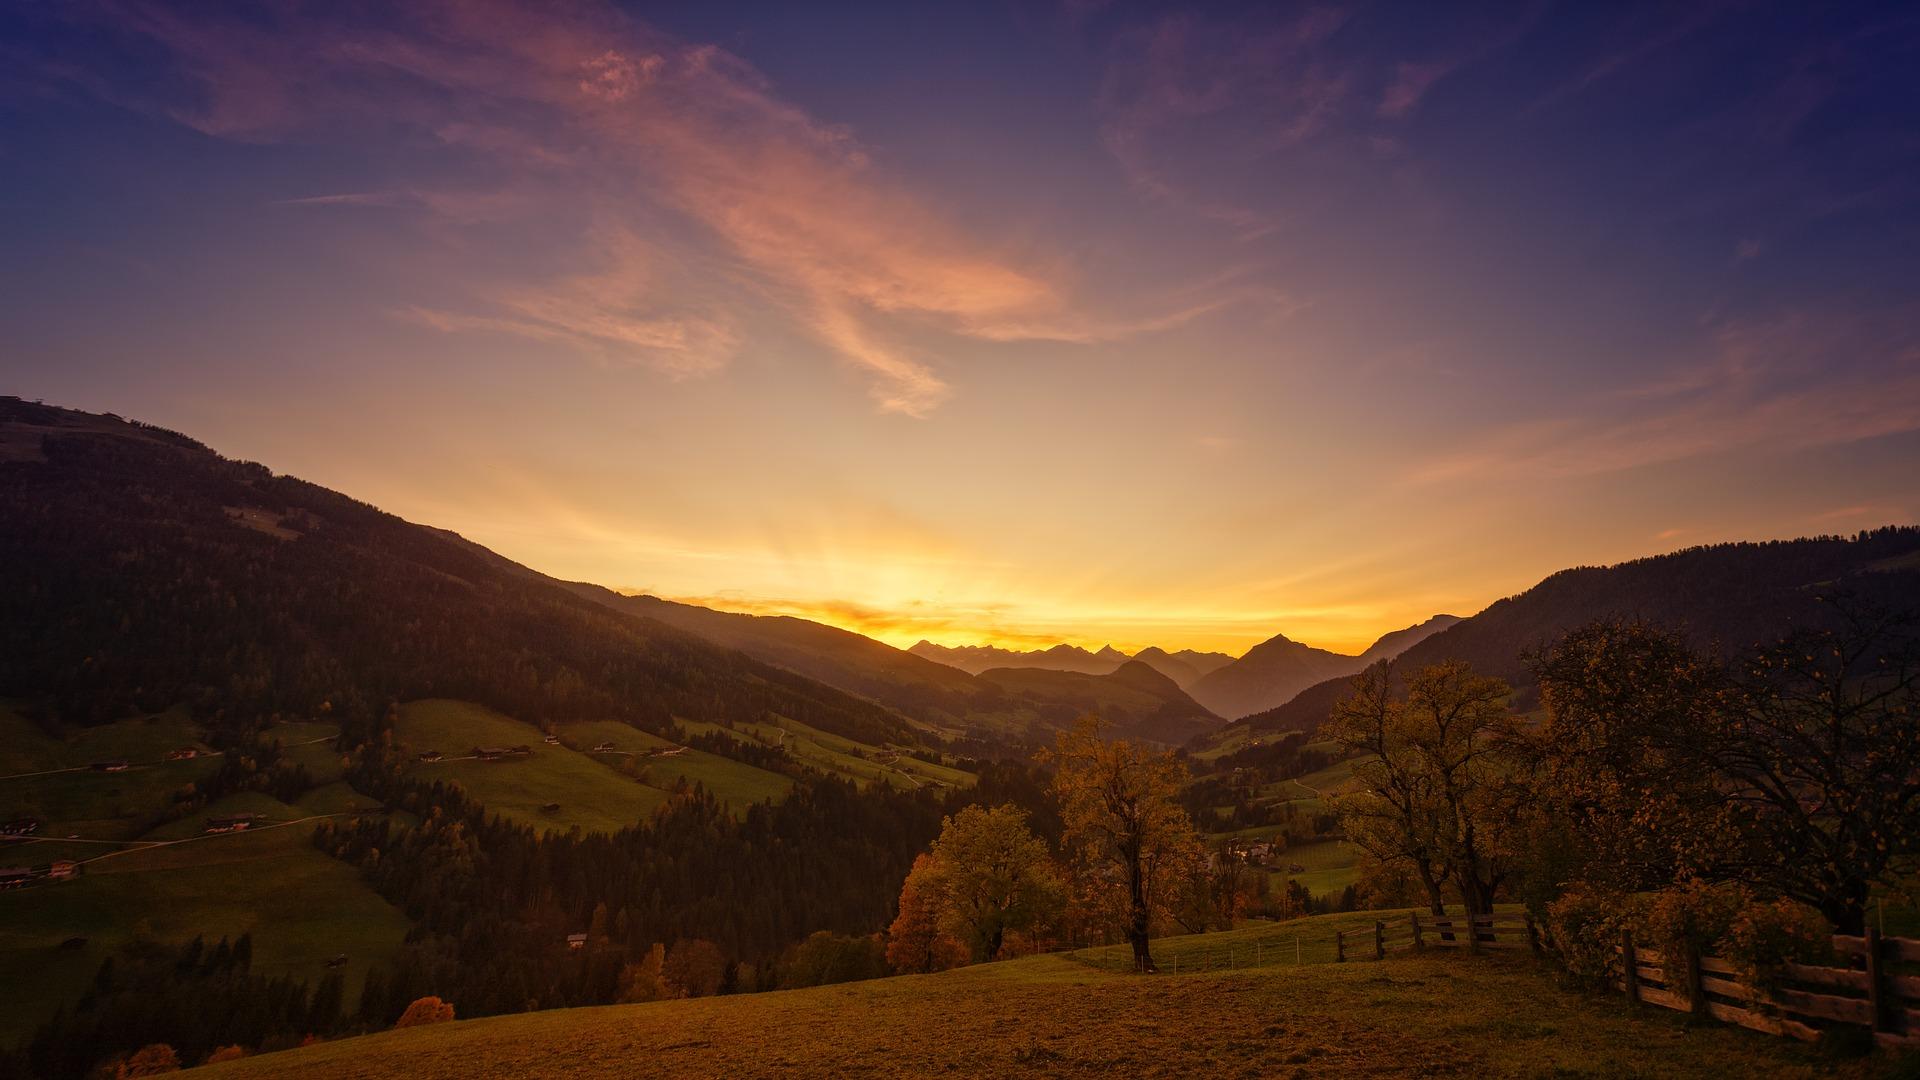 sunset-3437560_1920